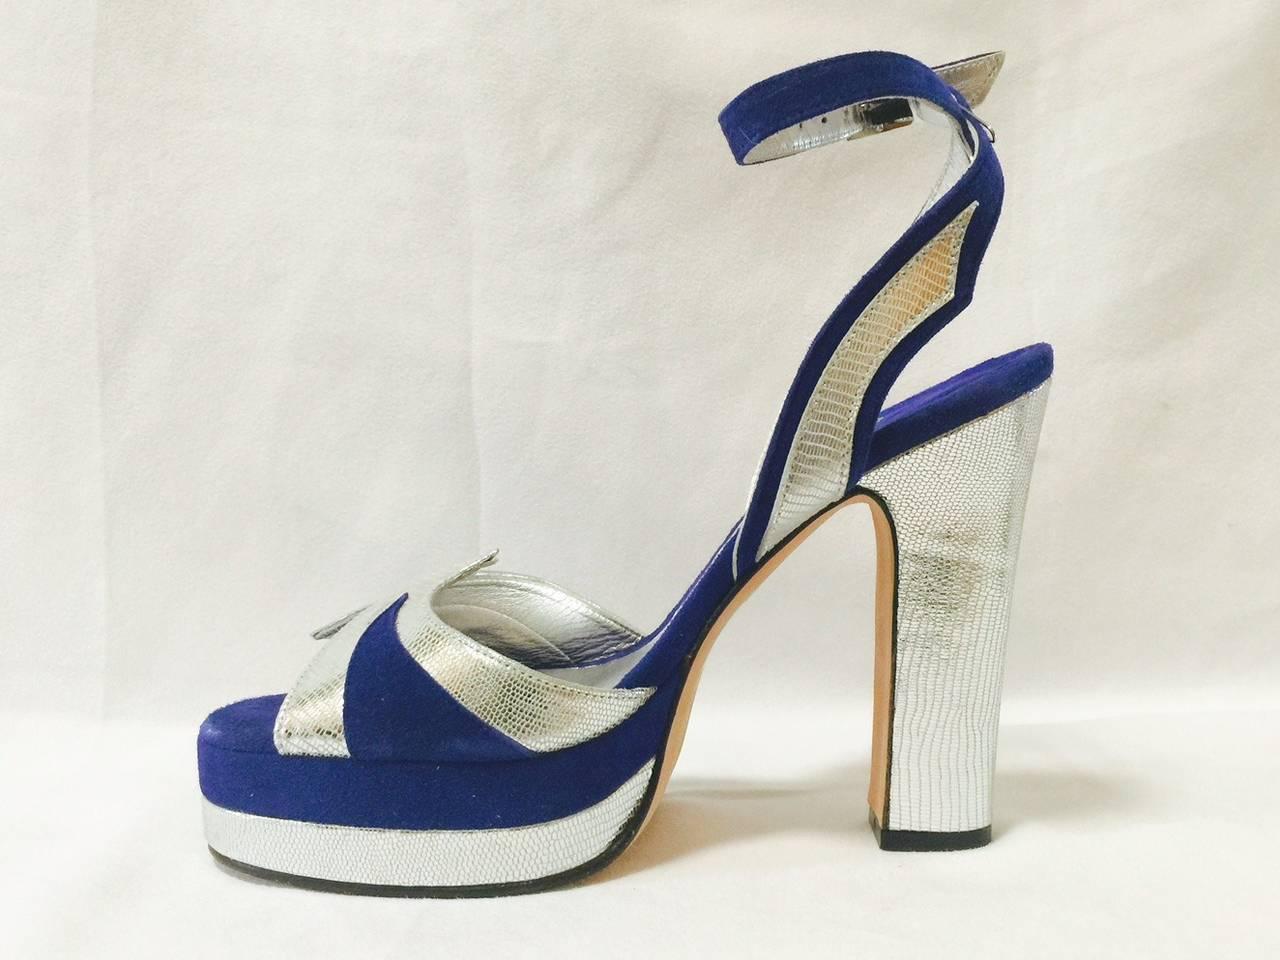 Gray New Terry de Havilland Blue Suede Platform Stacked High Heel Sandals For Sale